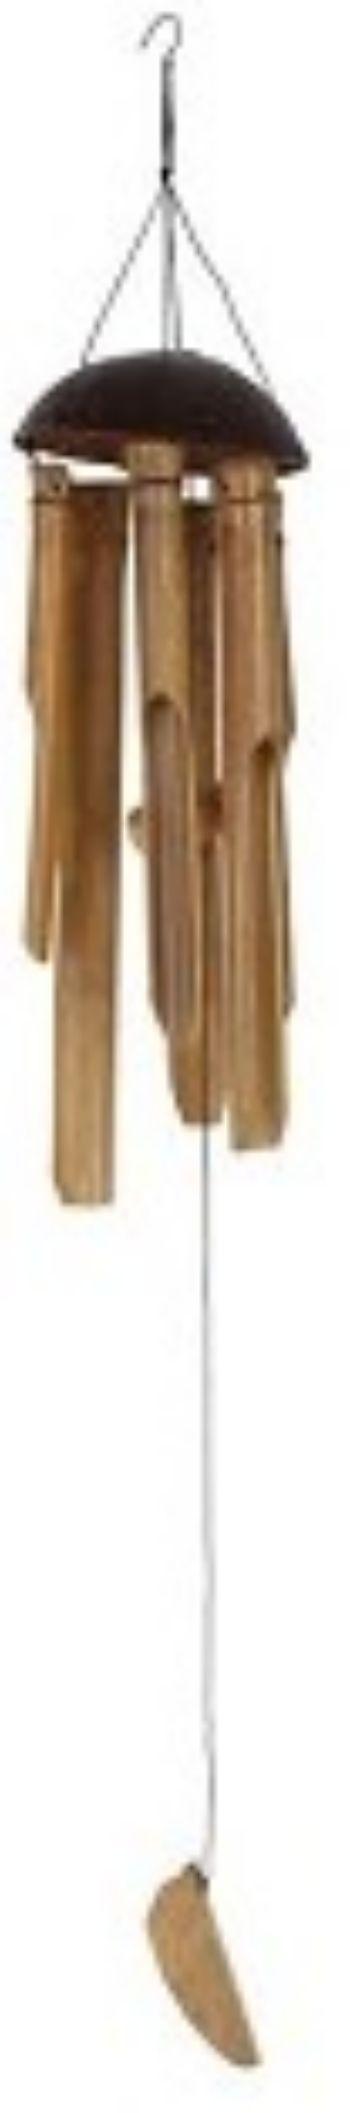 Музыка ветра КокосАксессуары и сувениры<br>Материал: бамбук.<br><br>Год: 2017<br>Высота: 350<br>Ширина: 100<br>Толщина: 100